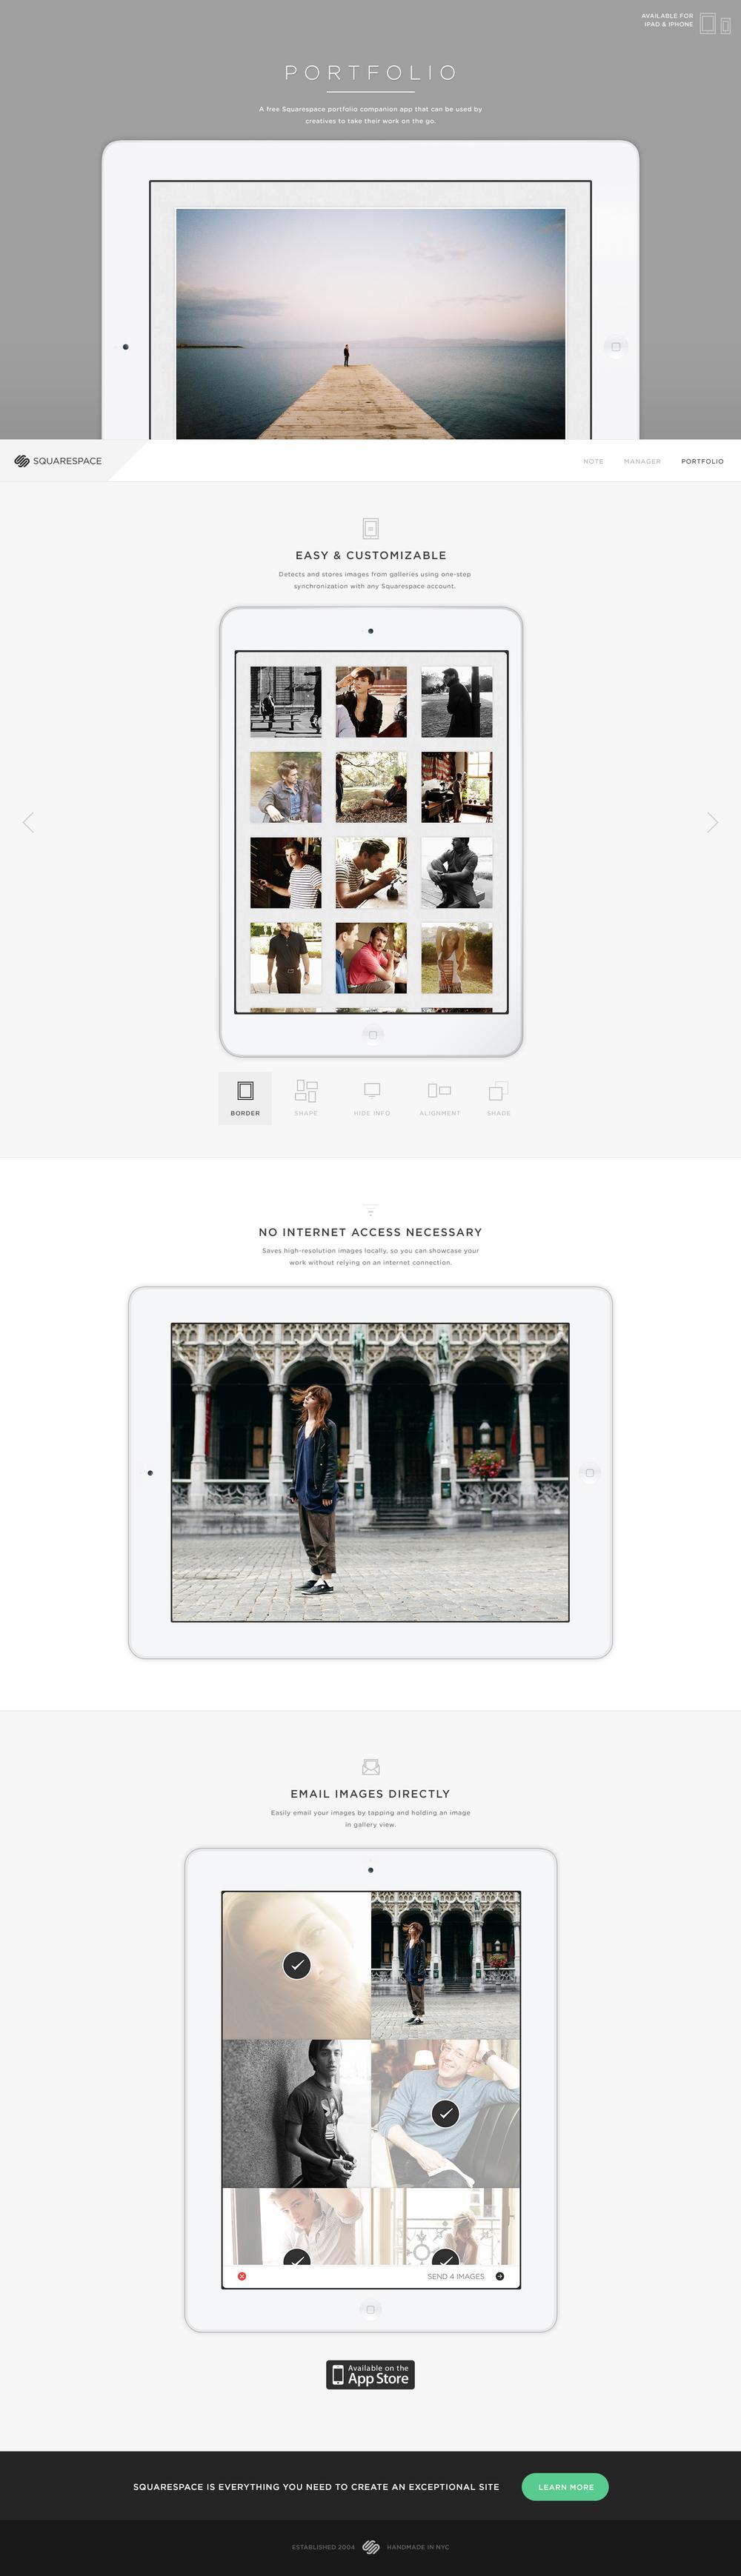 PortfolioSite.jpg